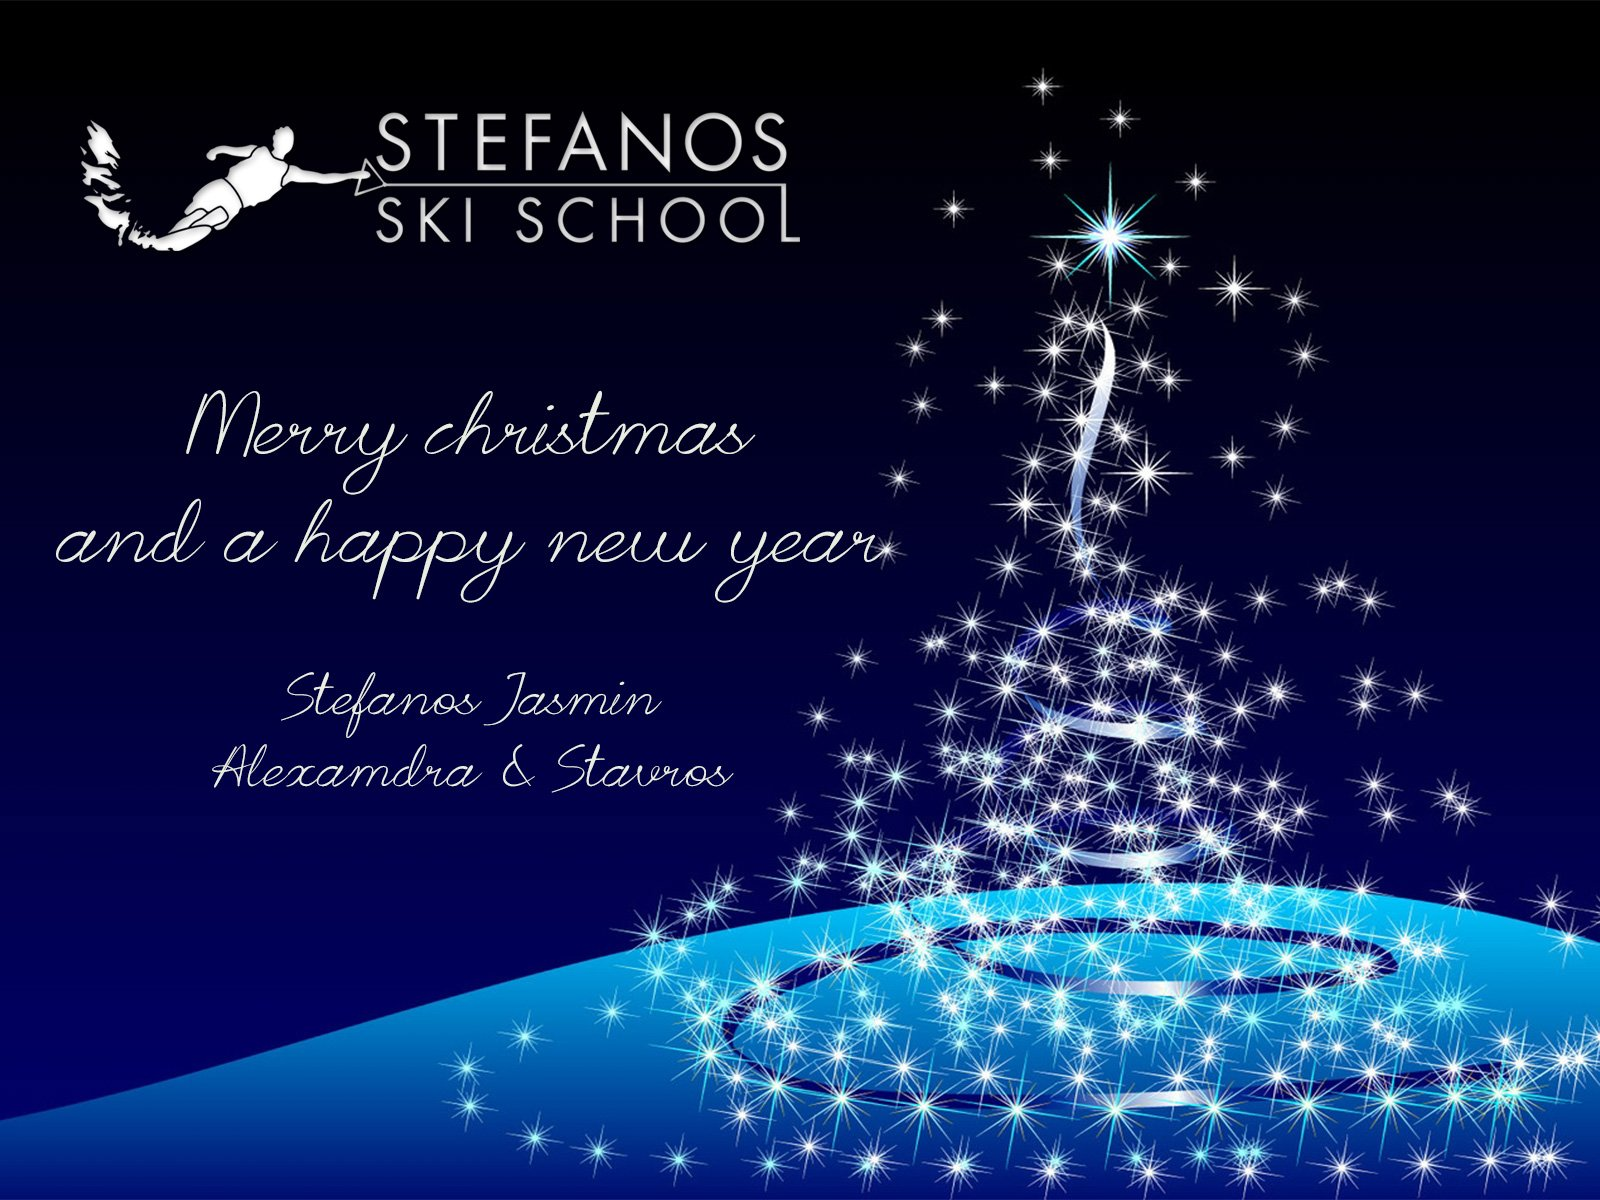 Skiathos in Christmas mood 1 Stefanos Ski School & Boat rental